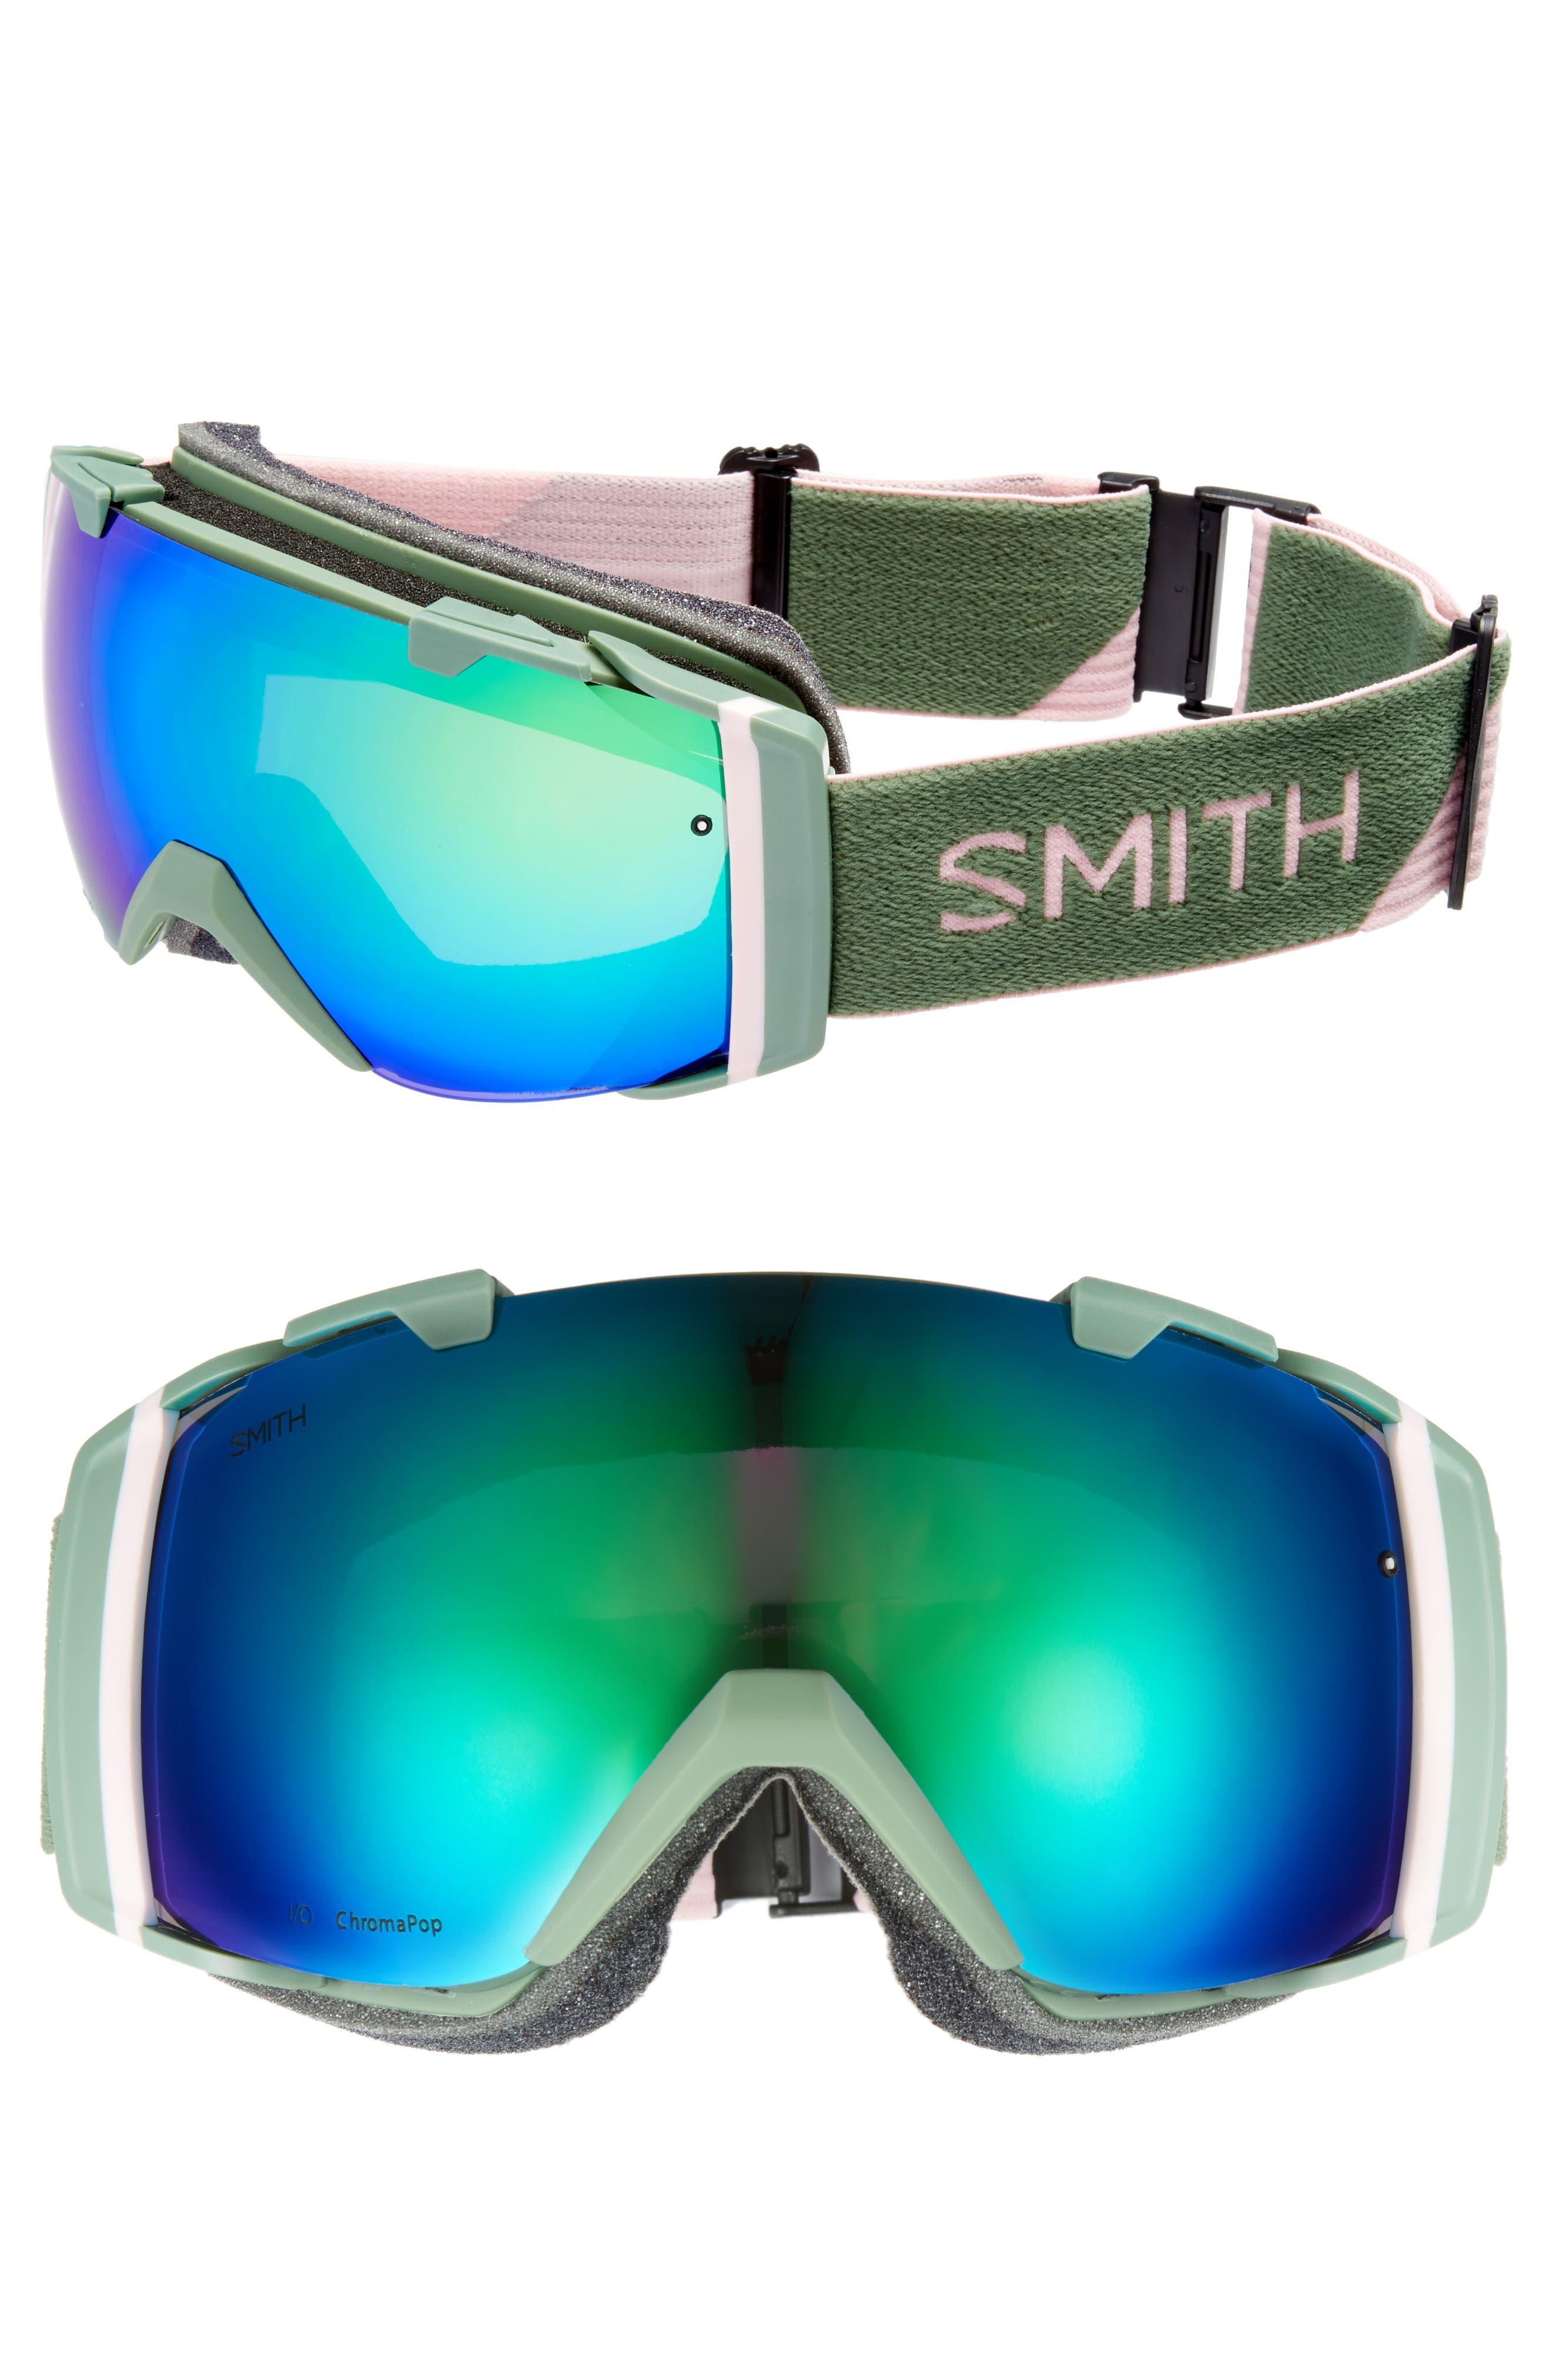 I/O 180mm Snow/Ski Goggles,                         Main,                         color, Patina Split/ Mirror